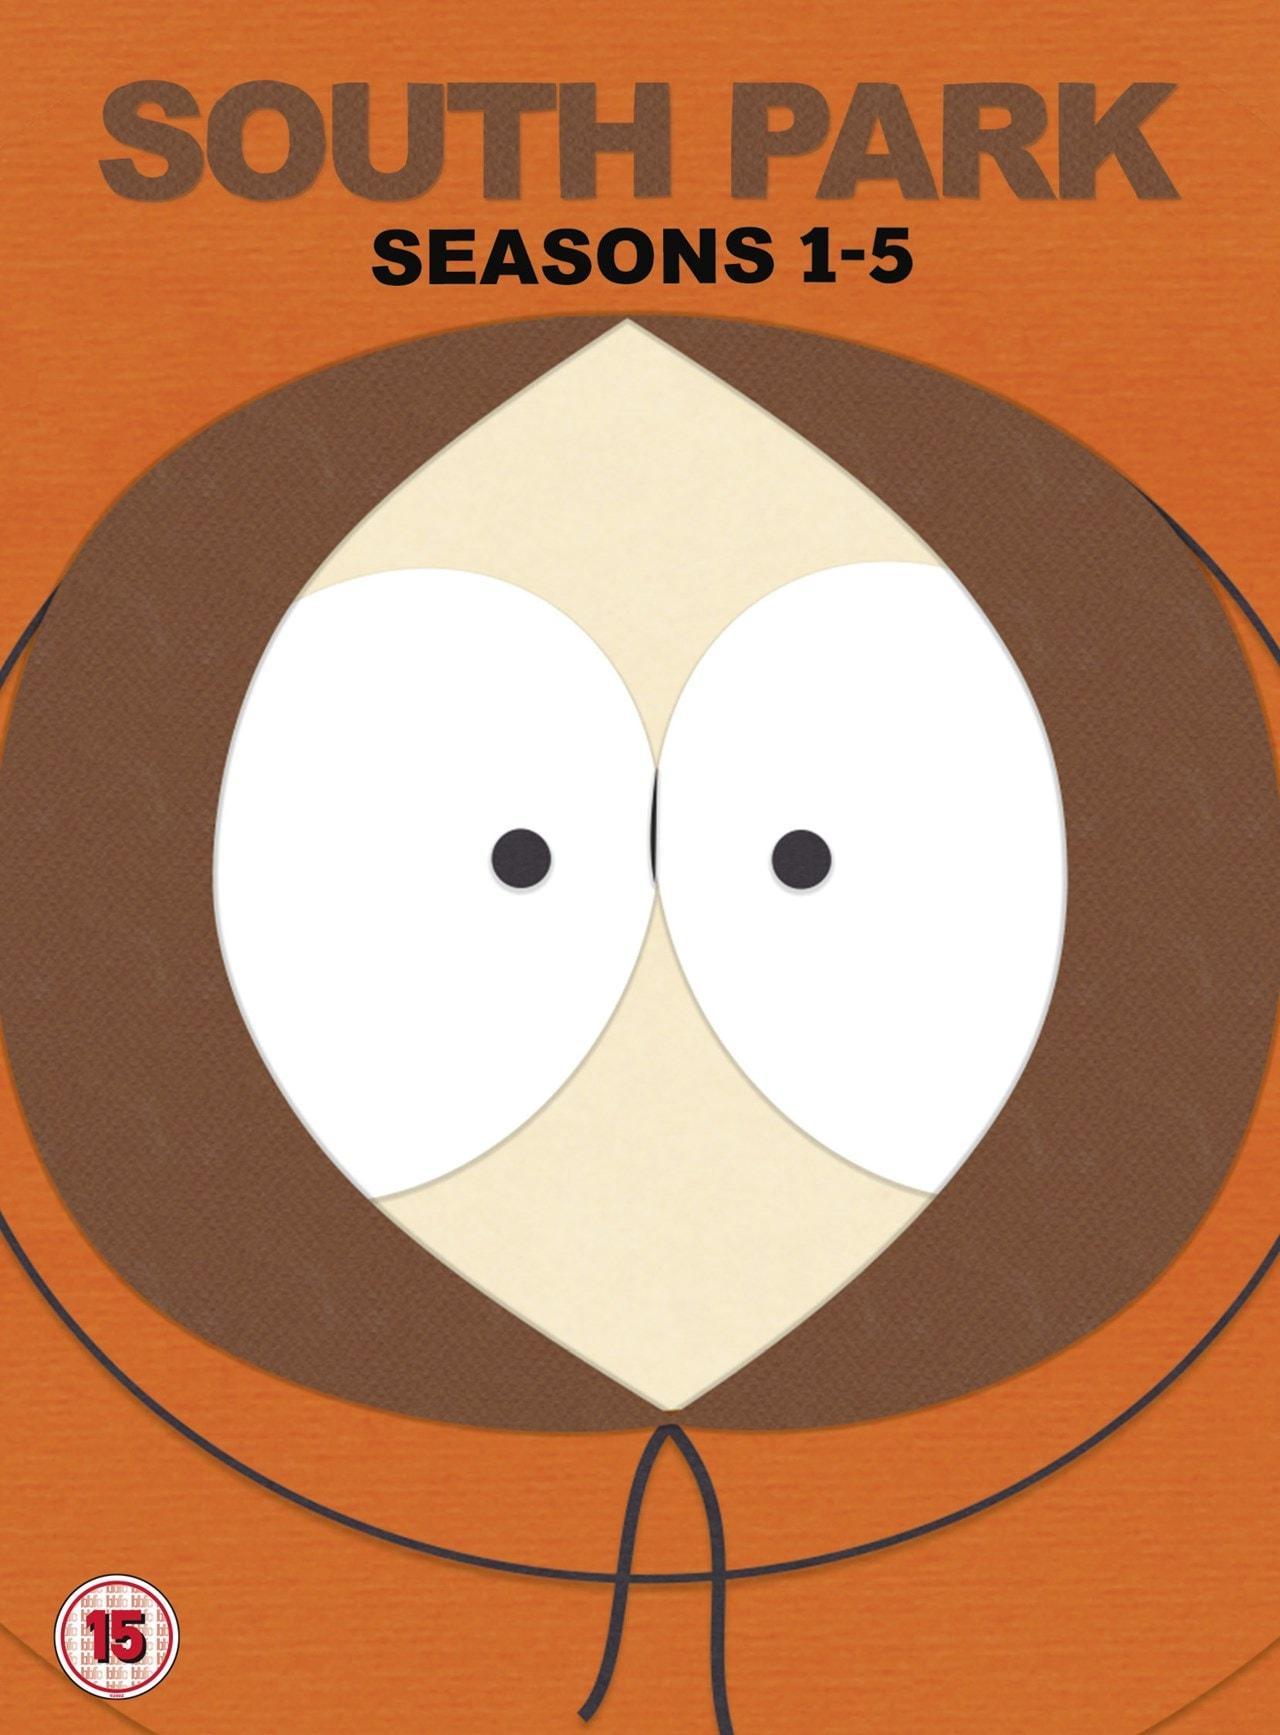 South Park: Seasons 1-5 - 1